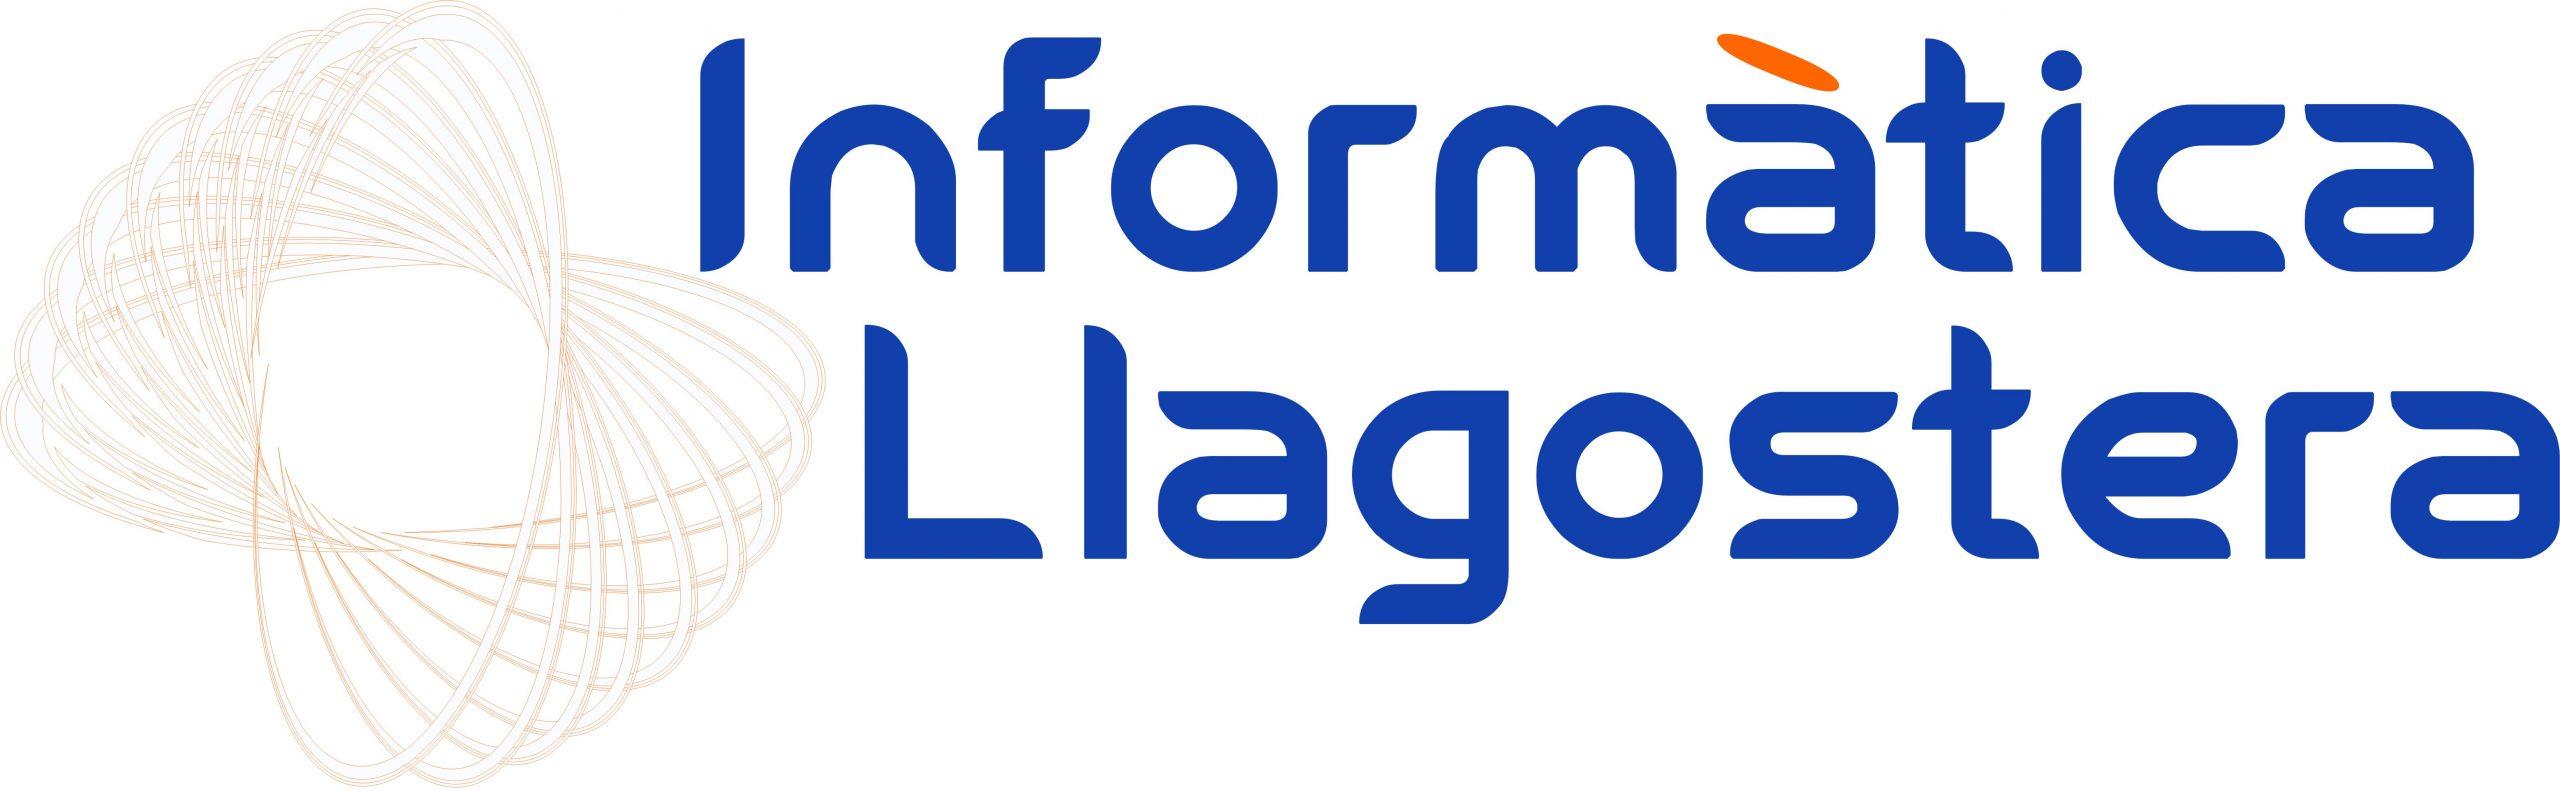 https://www.cbllagostera.com/wp-content/uploads/2021/05/3-logo-informatica-llagostera-vidre-scaled.jpg